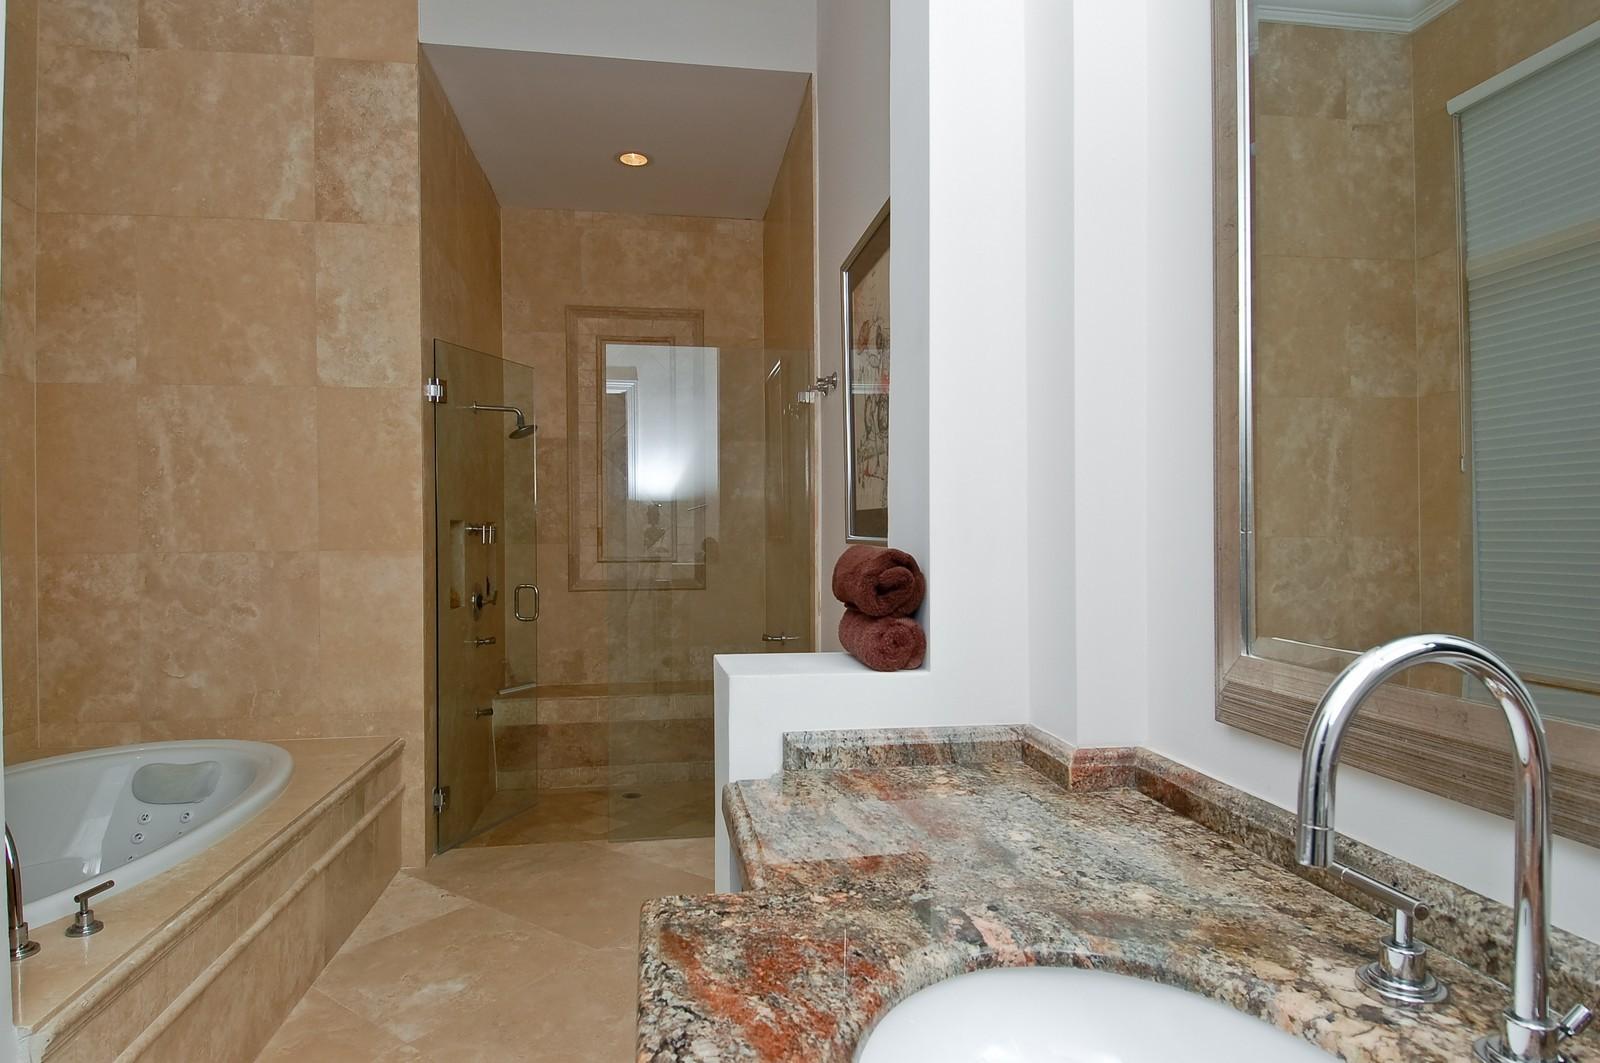 Real Estate Photography - 7478 Valencia Dr, Boca Raton, FL, 33433 - Master Bathroom